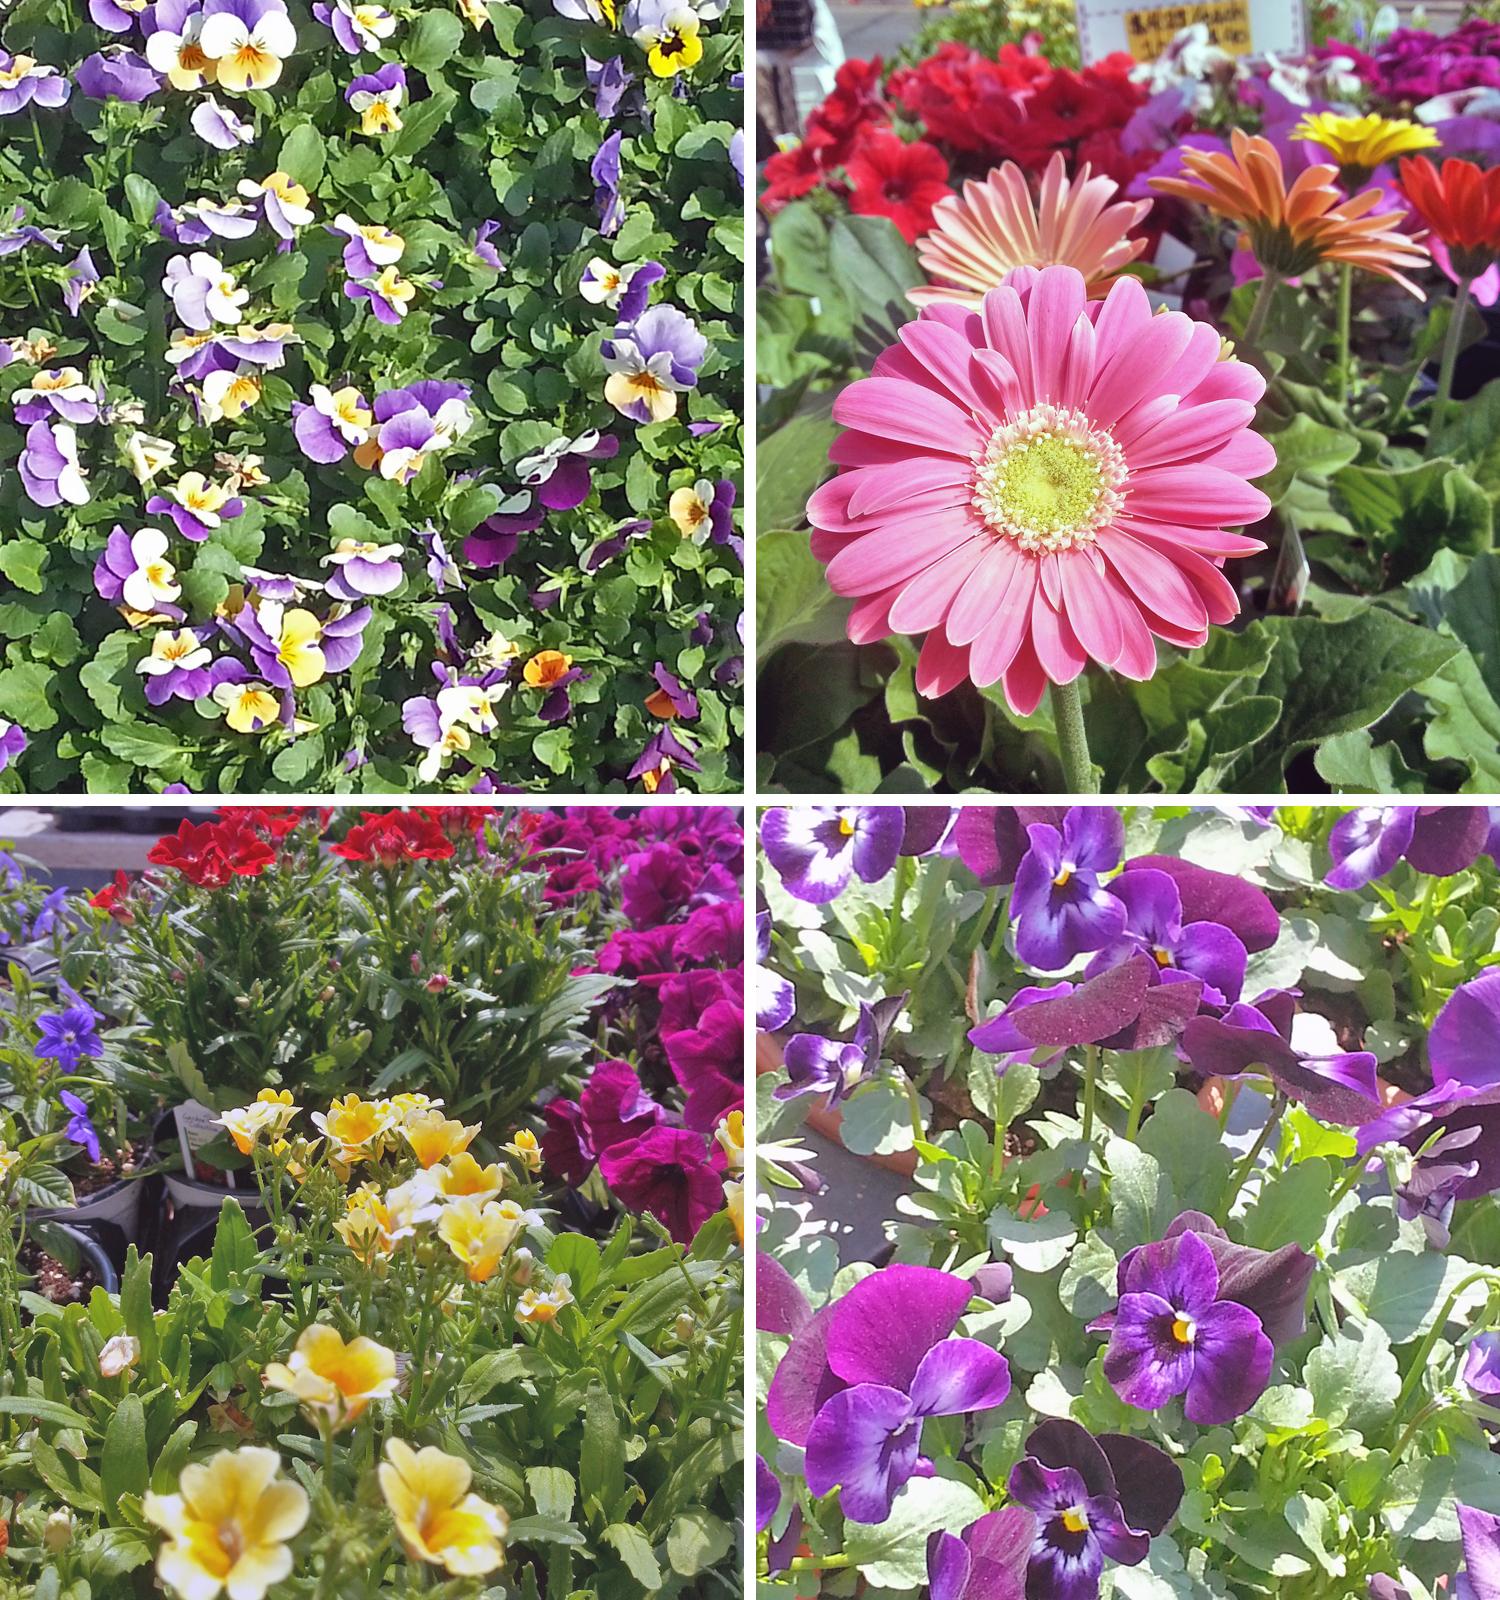 usq-flowers-4